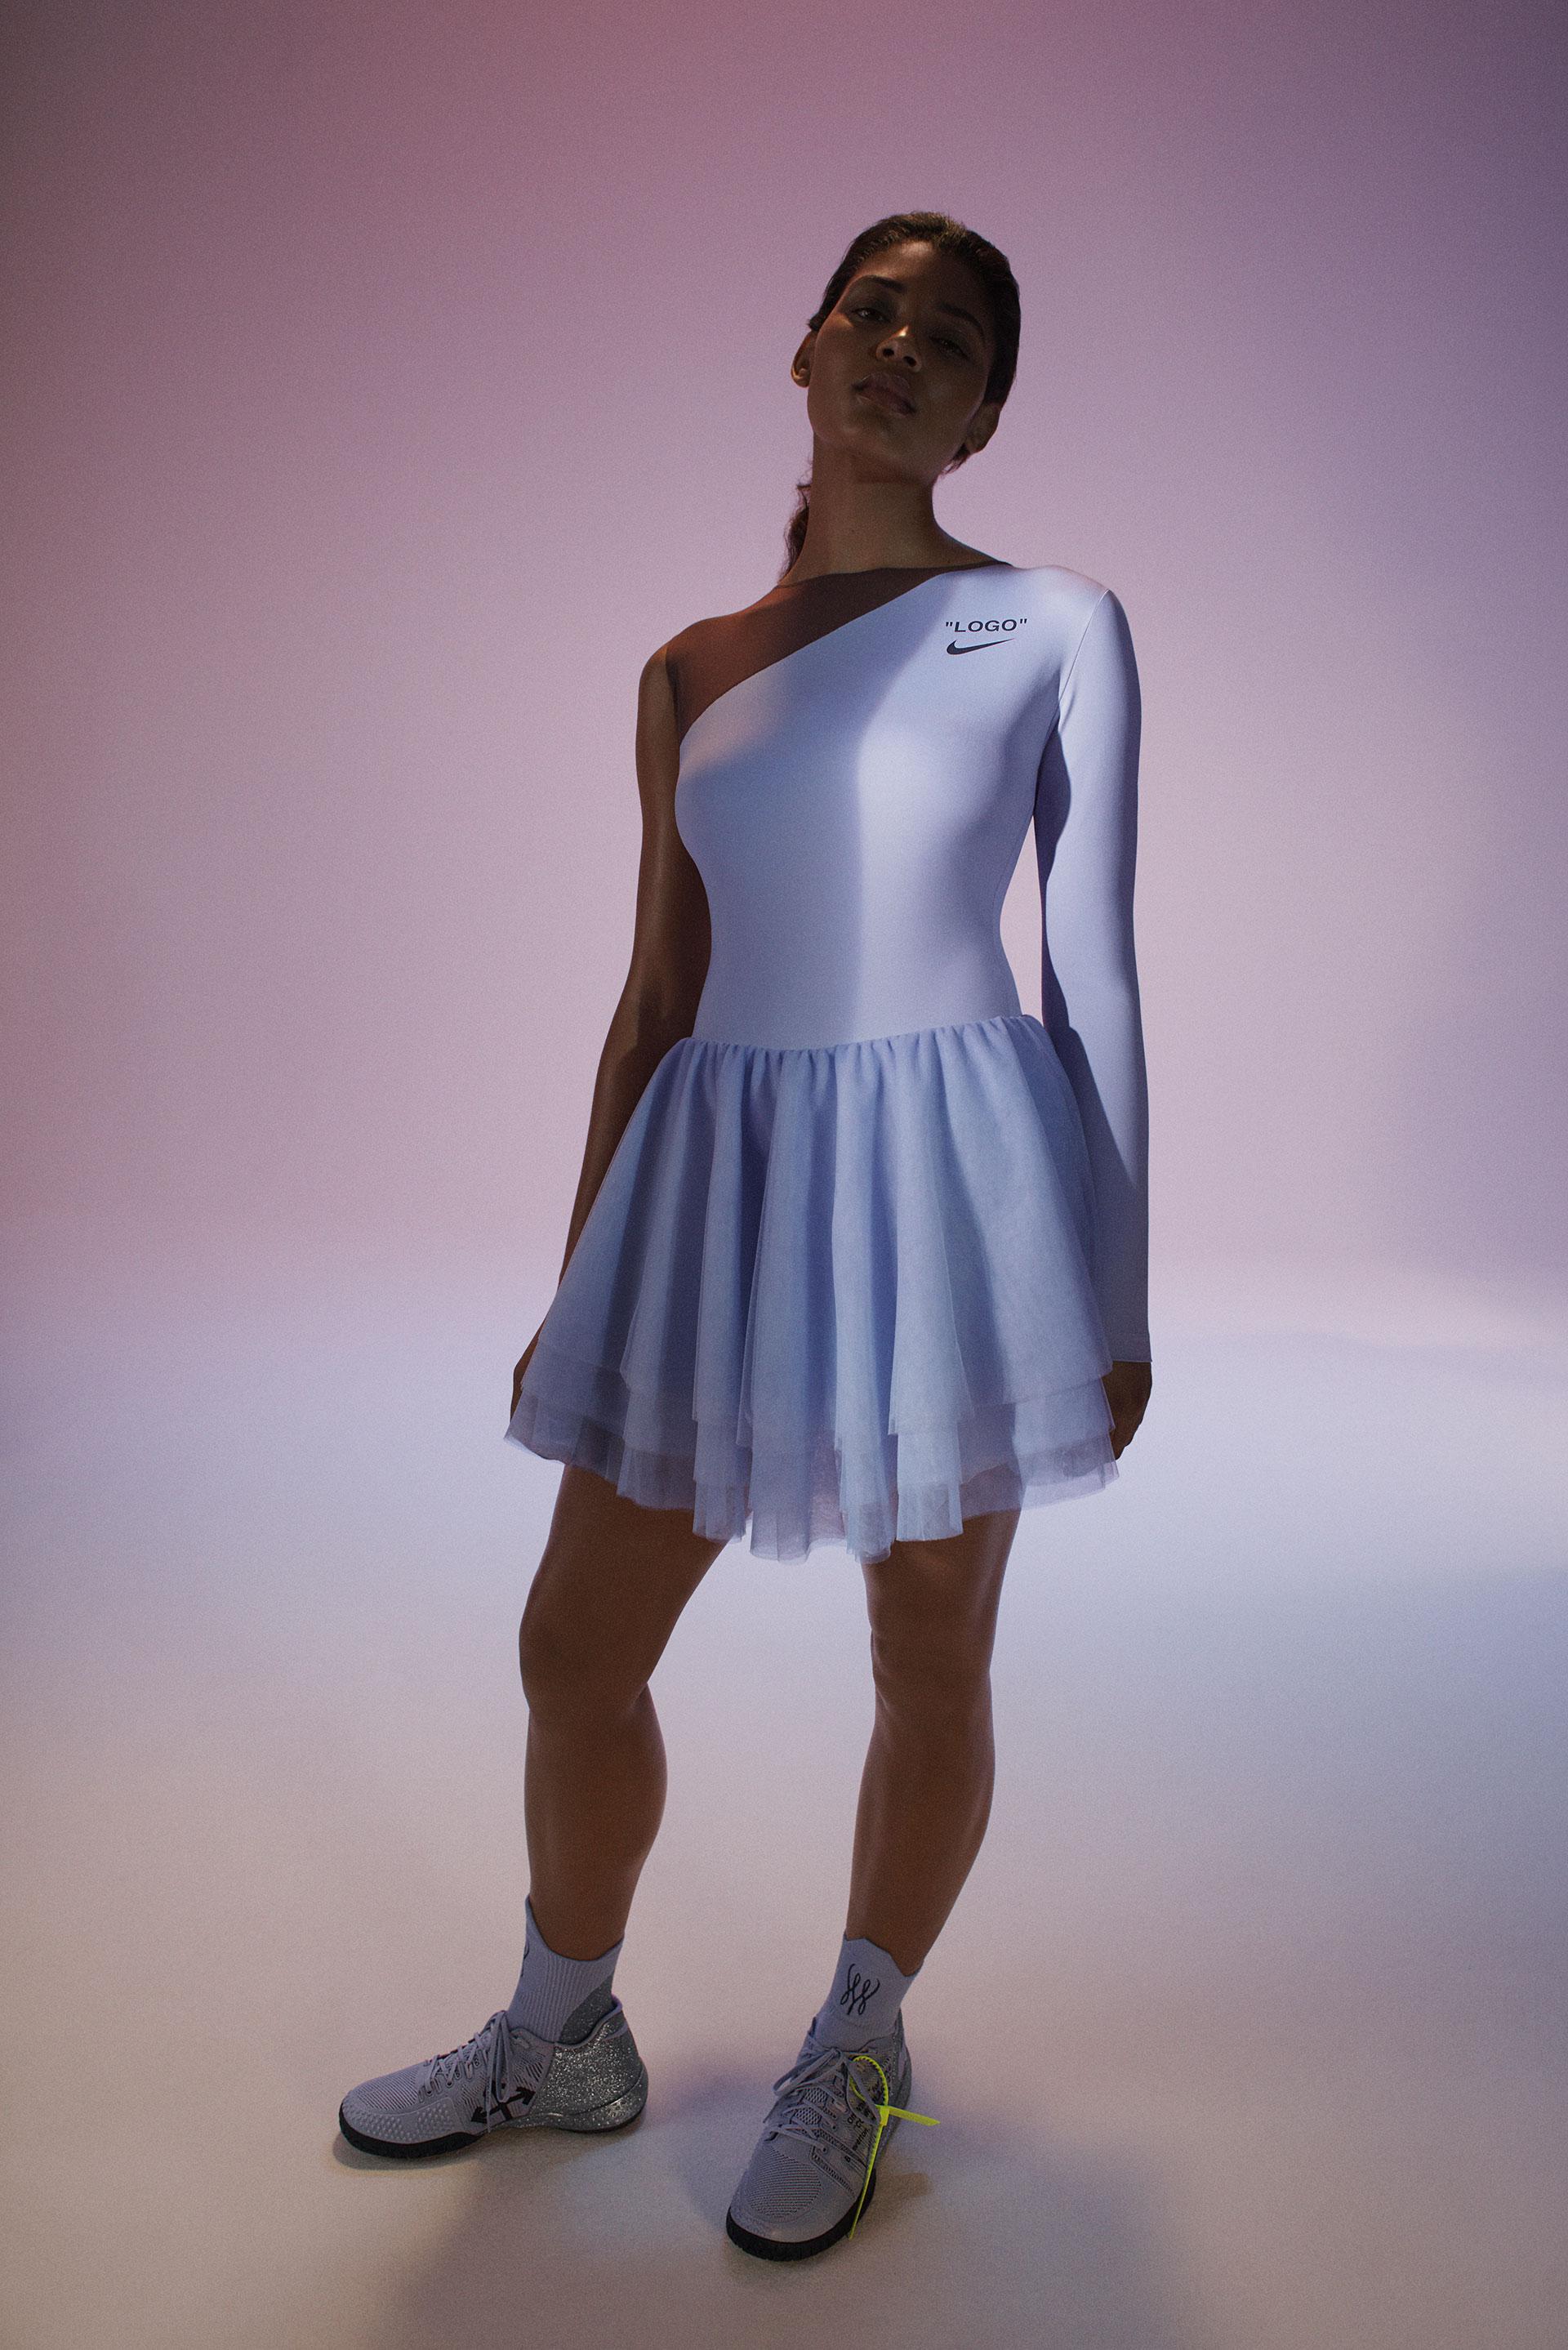 Daytime dress designed by Virgil Abloh for Serena Williams